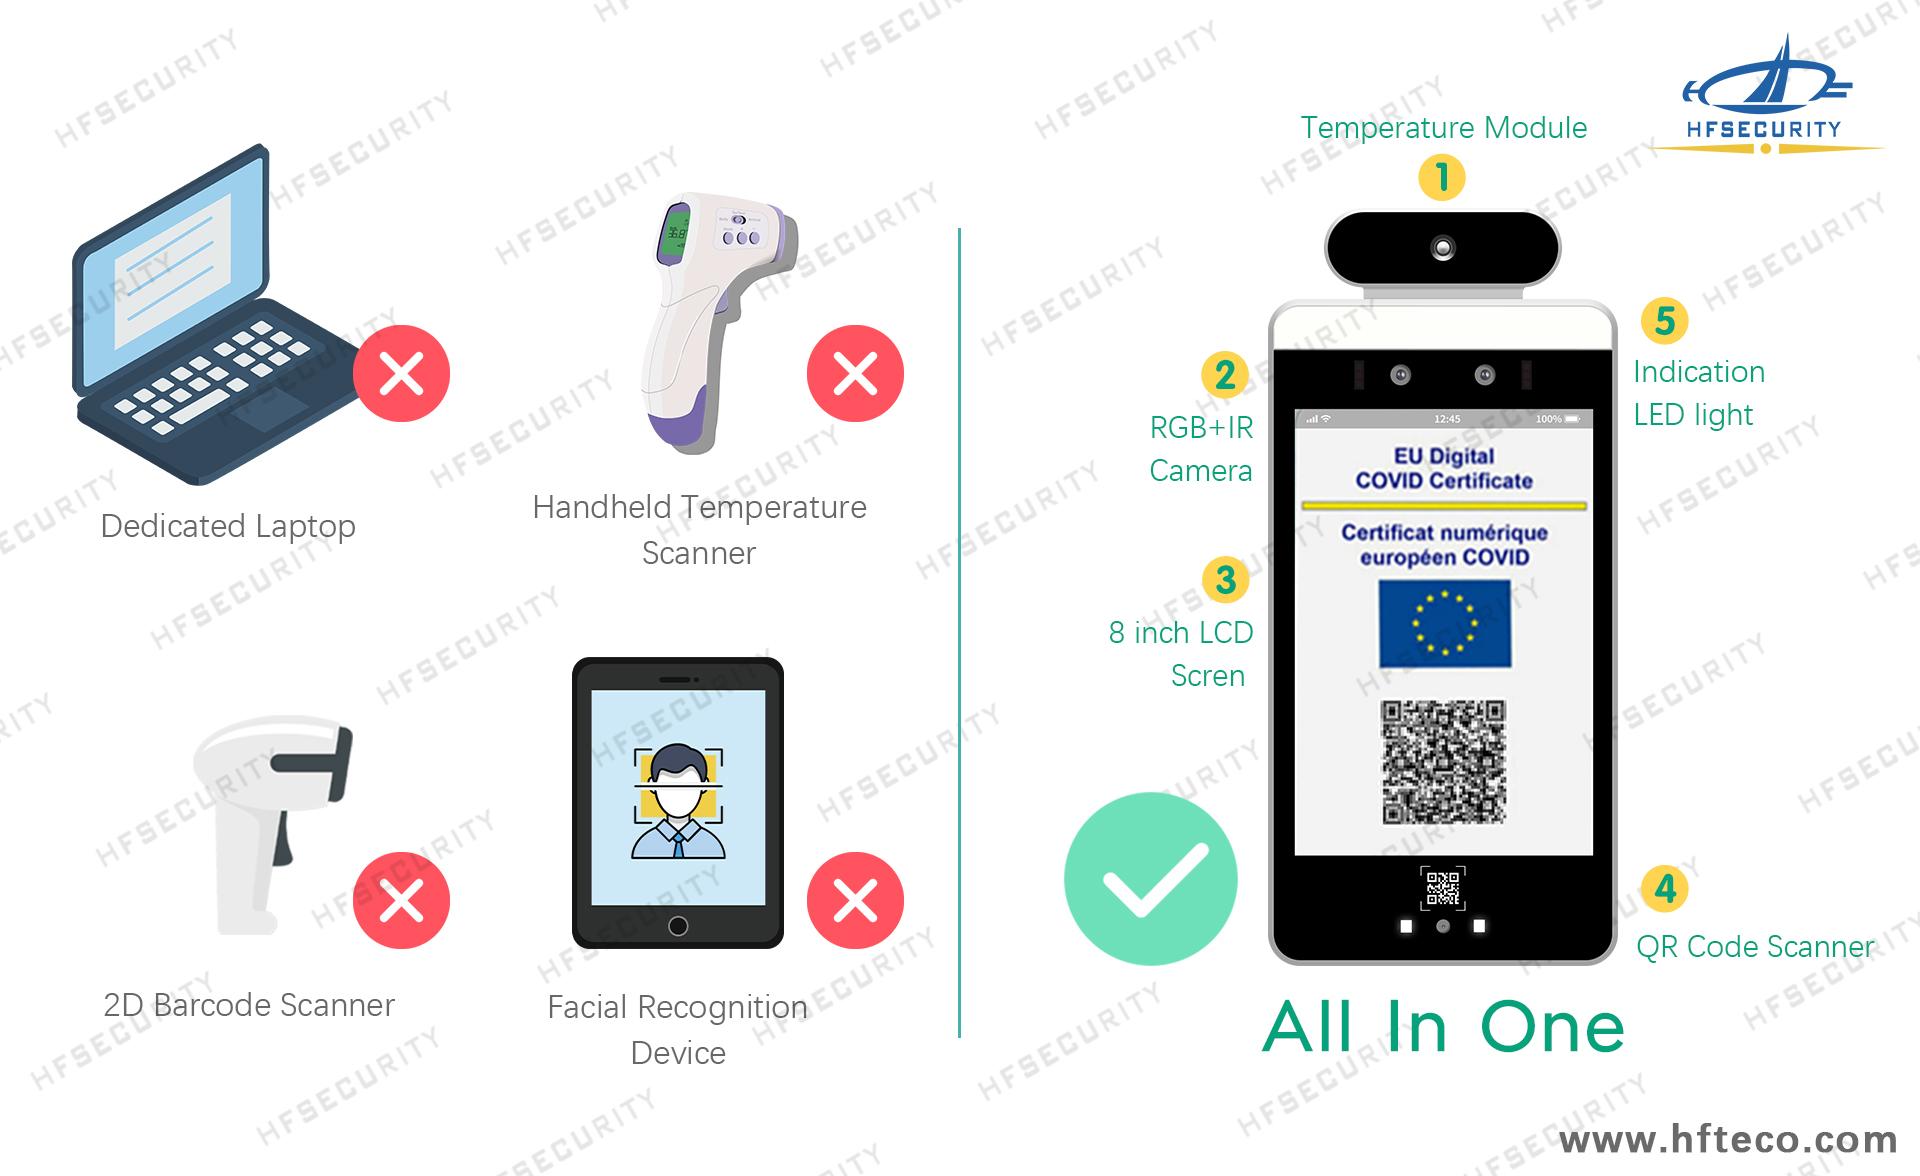 EU Digital HFSecurity Health Code Device